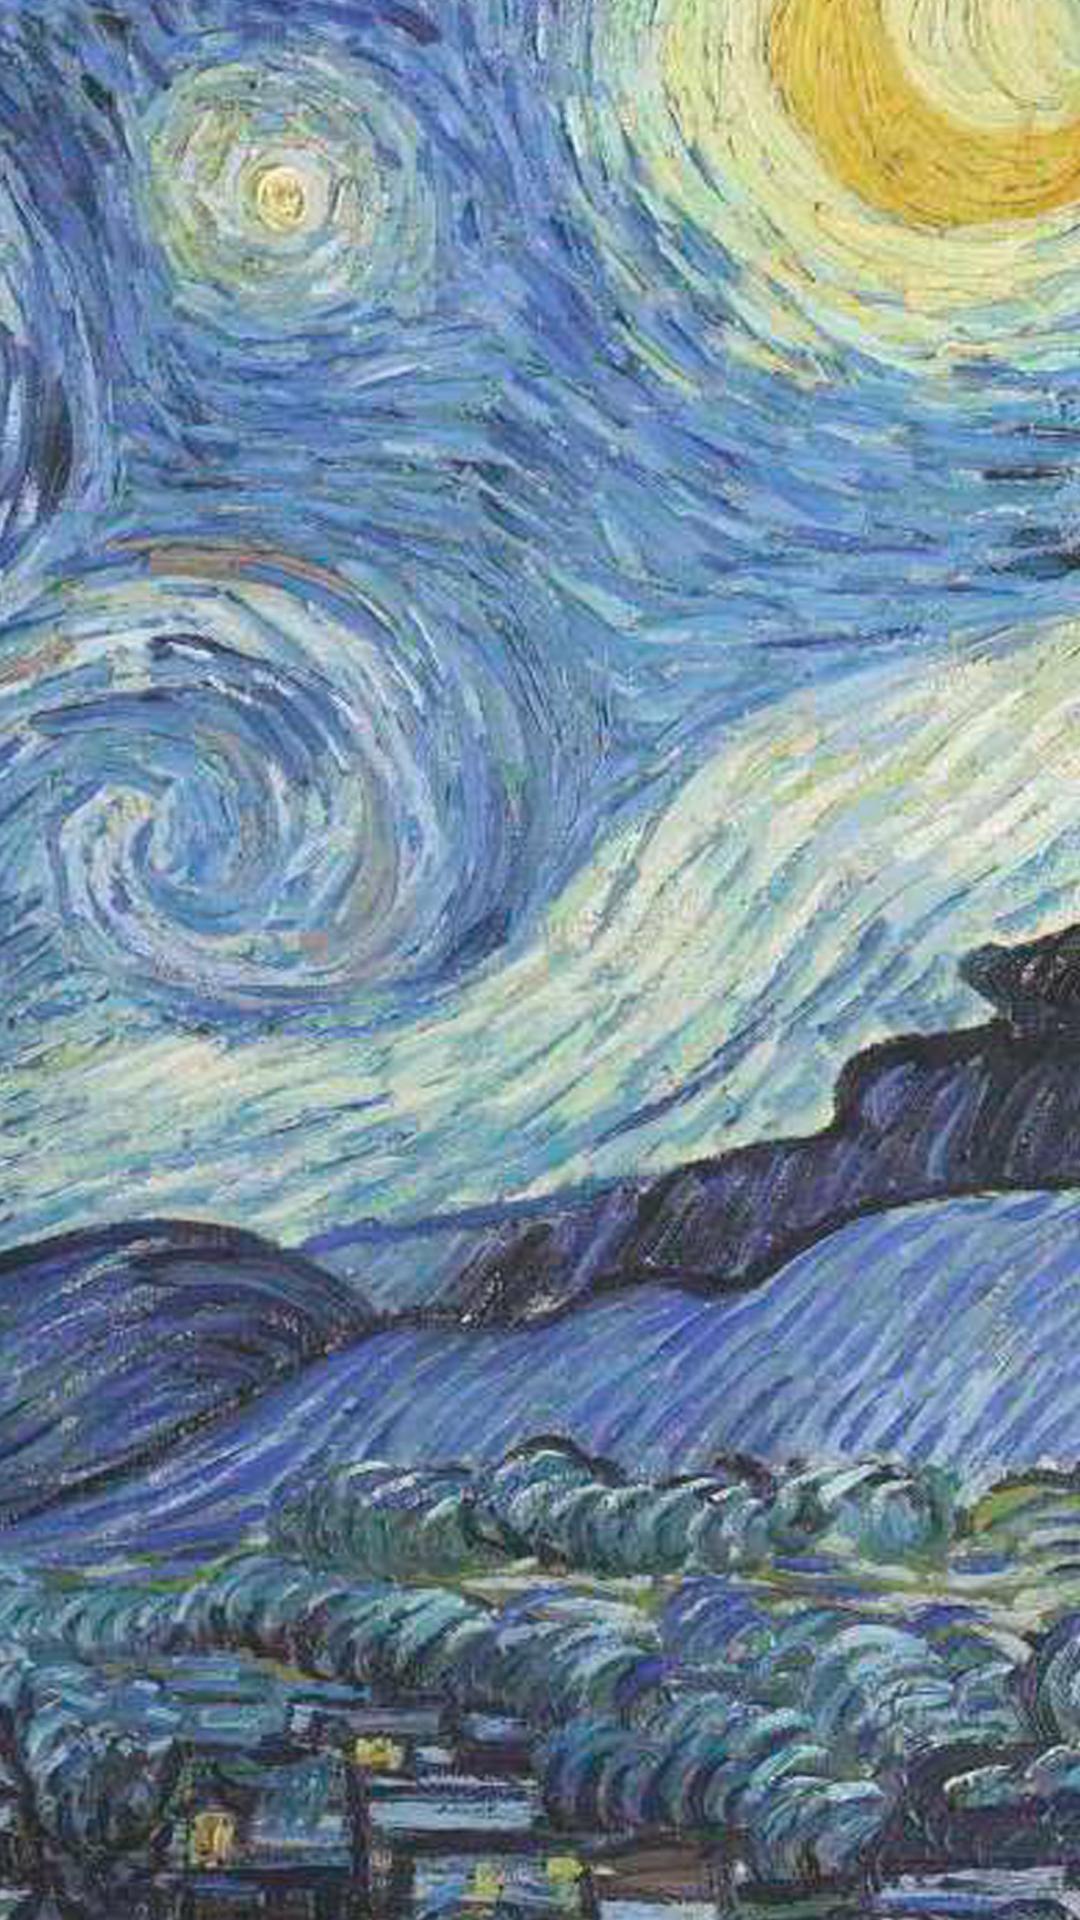 Wallpaper Van Gogh By Gocase Blue Azul Yellow Amarelo Noite